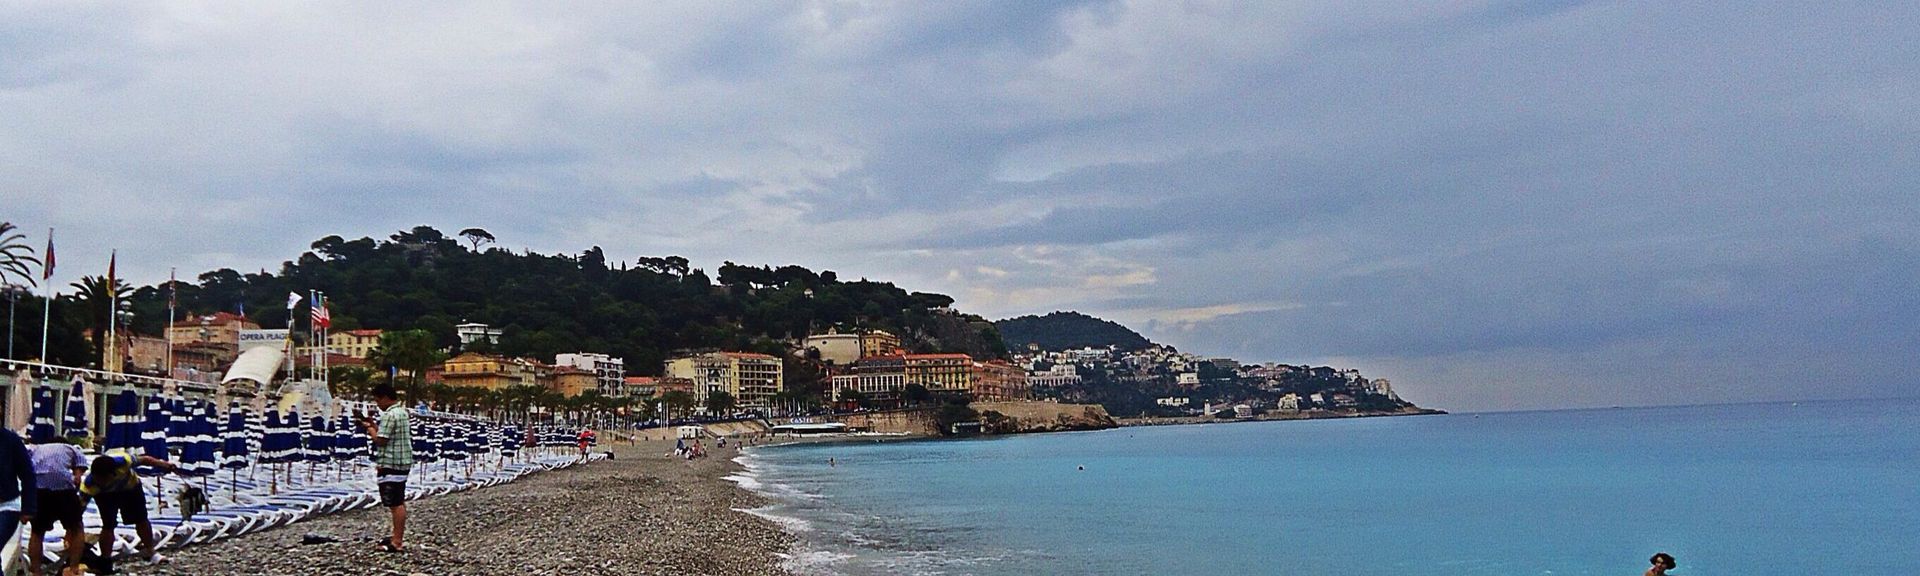 Promenade des Anglais, Nizza, Alpi Marittime, Francia